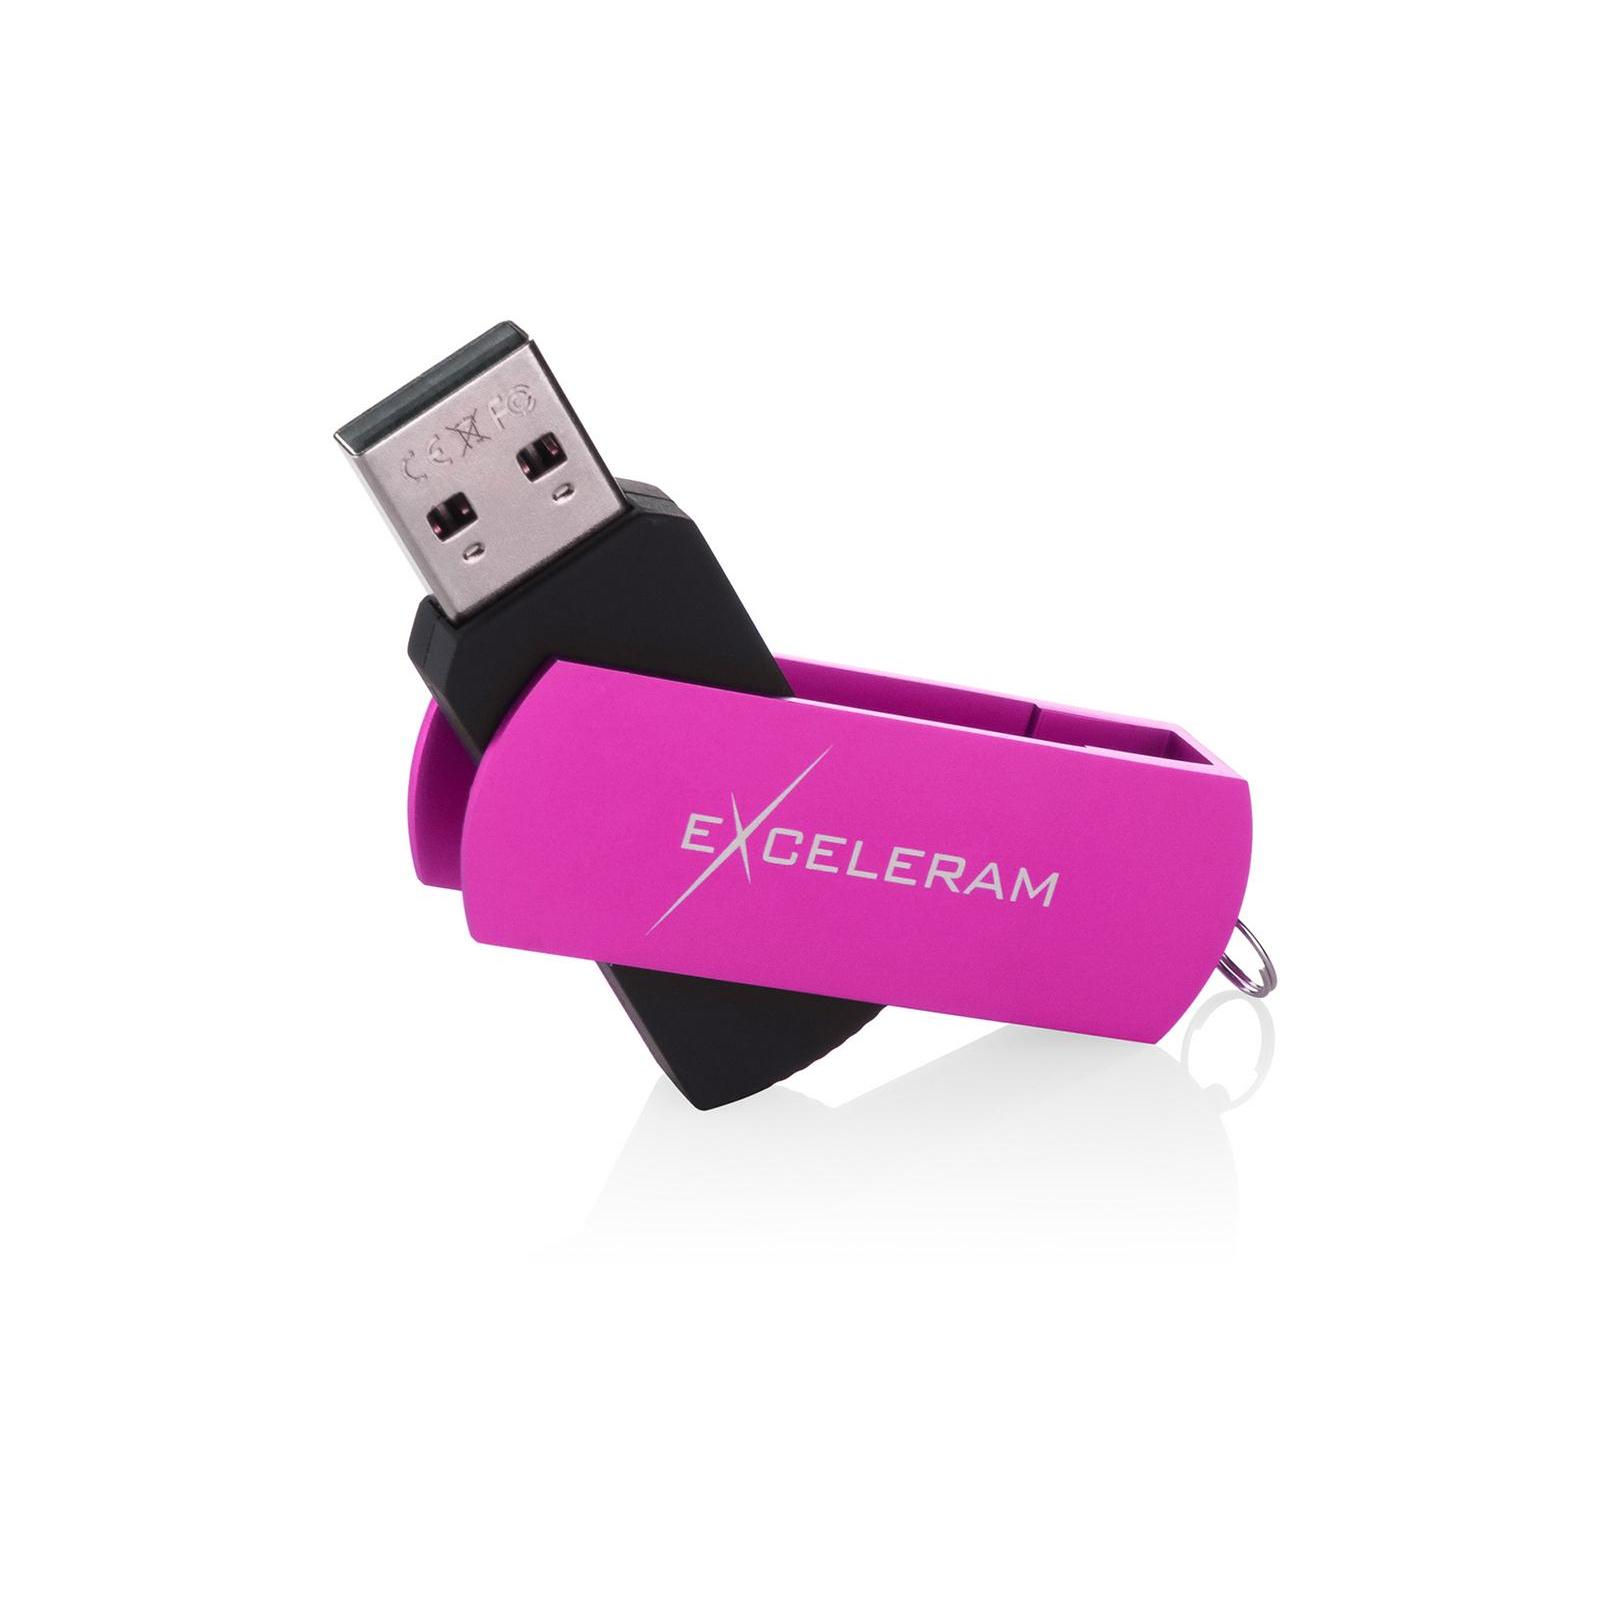 USB флеш накопитель eXceleram 8GB P2 Series Rose/Black USB 2.0 (EXP2U2ROB08) изображение 3